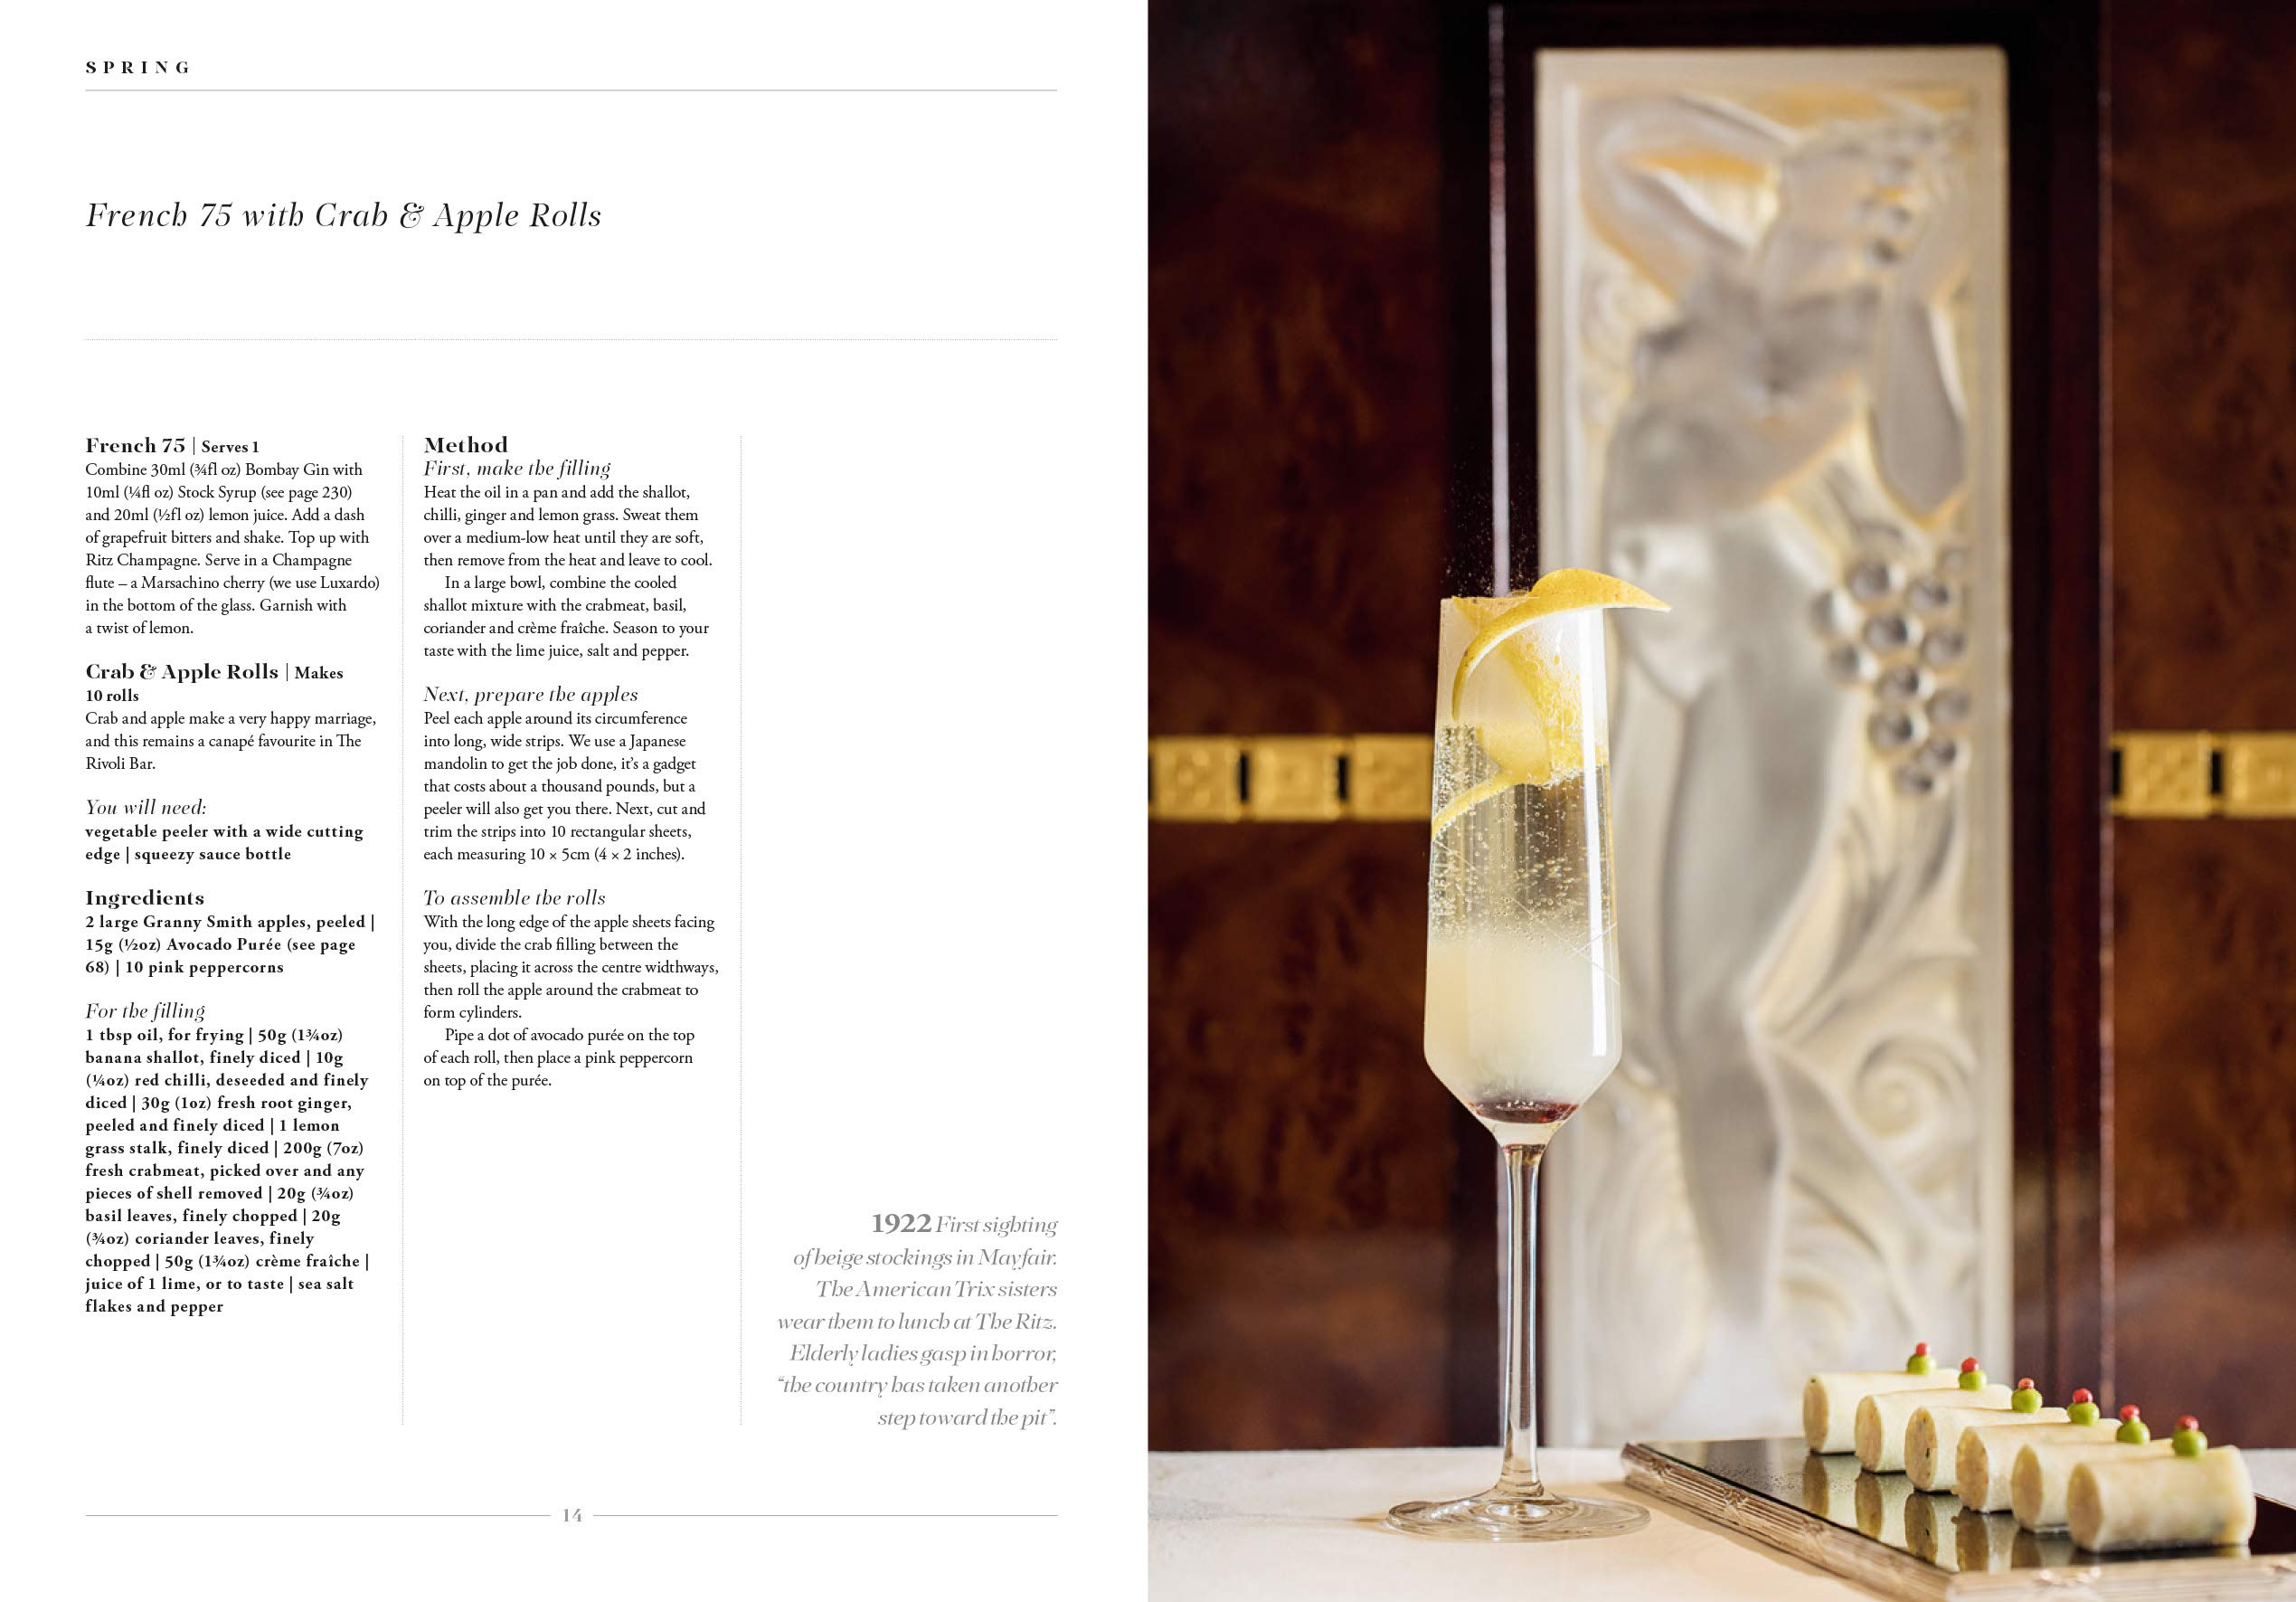 The Ritz London Cookbook John Williams 9781784724962 Amazon Silver Queen Montes 50g Books